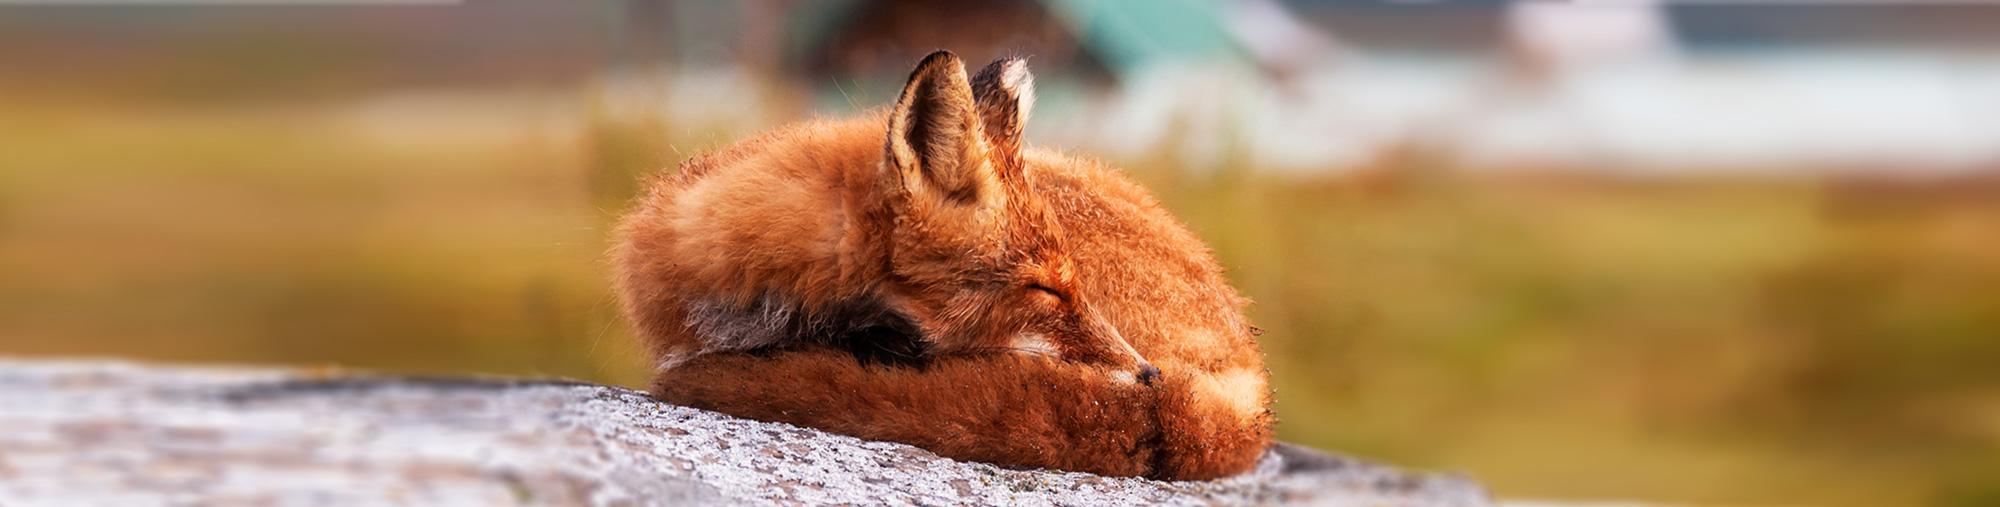 h2-foxsleep.jpg